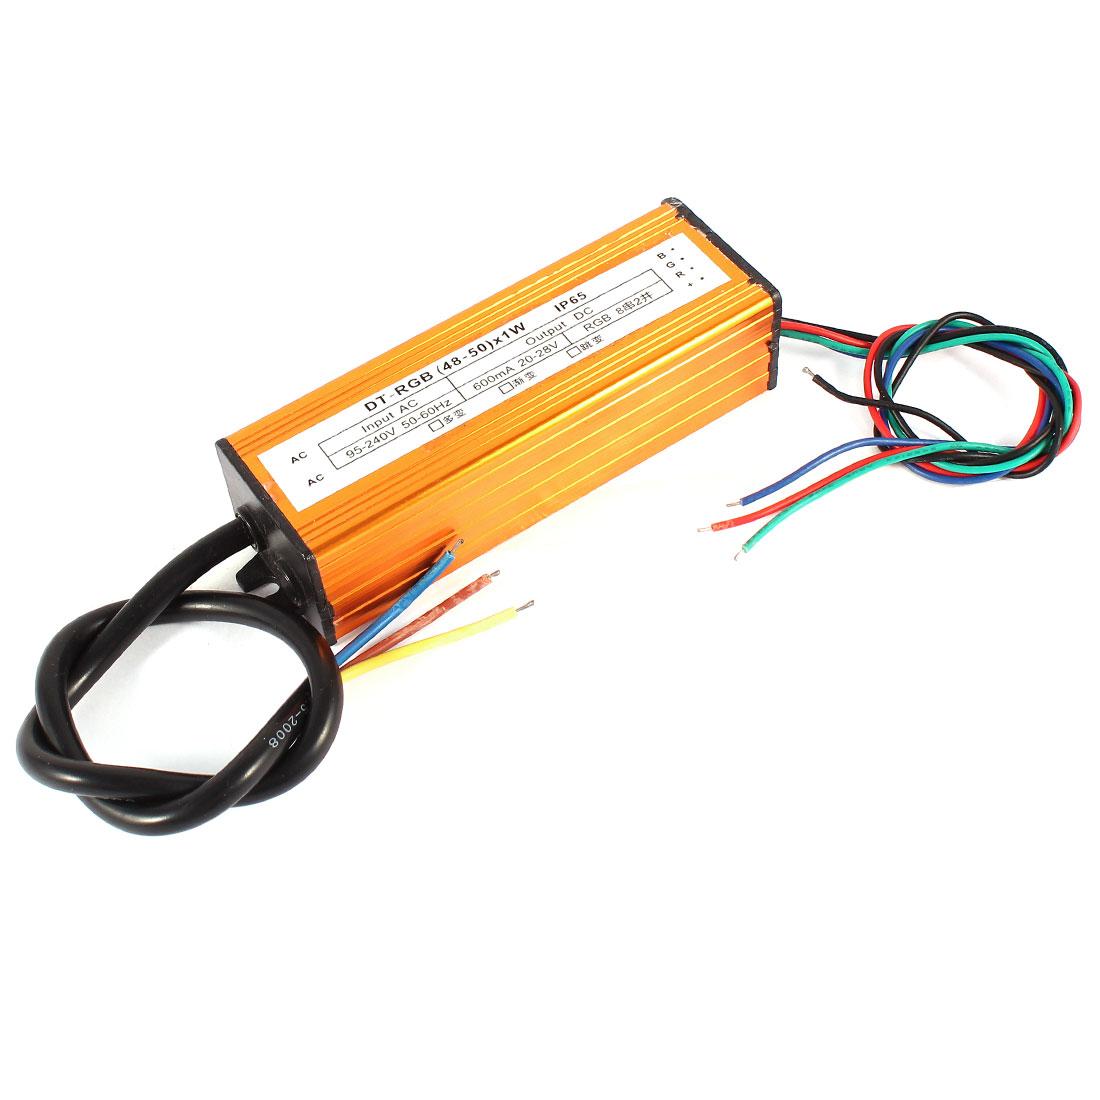 (48-50)x1W Waterproof LED Driver Transformer Power Supply for RGB Light Strip